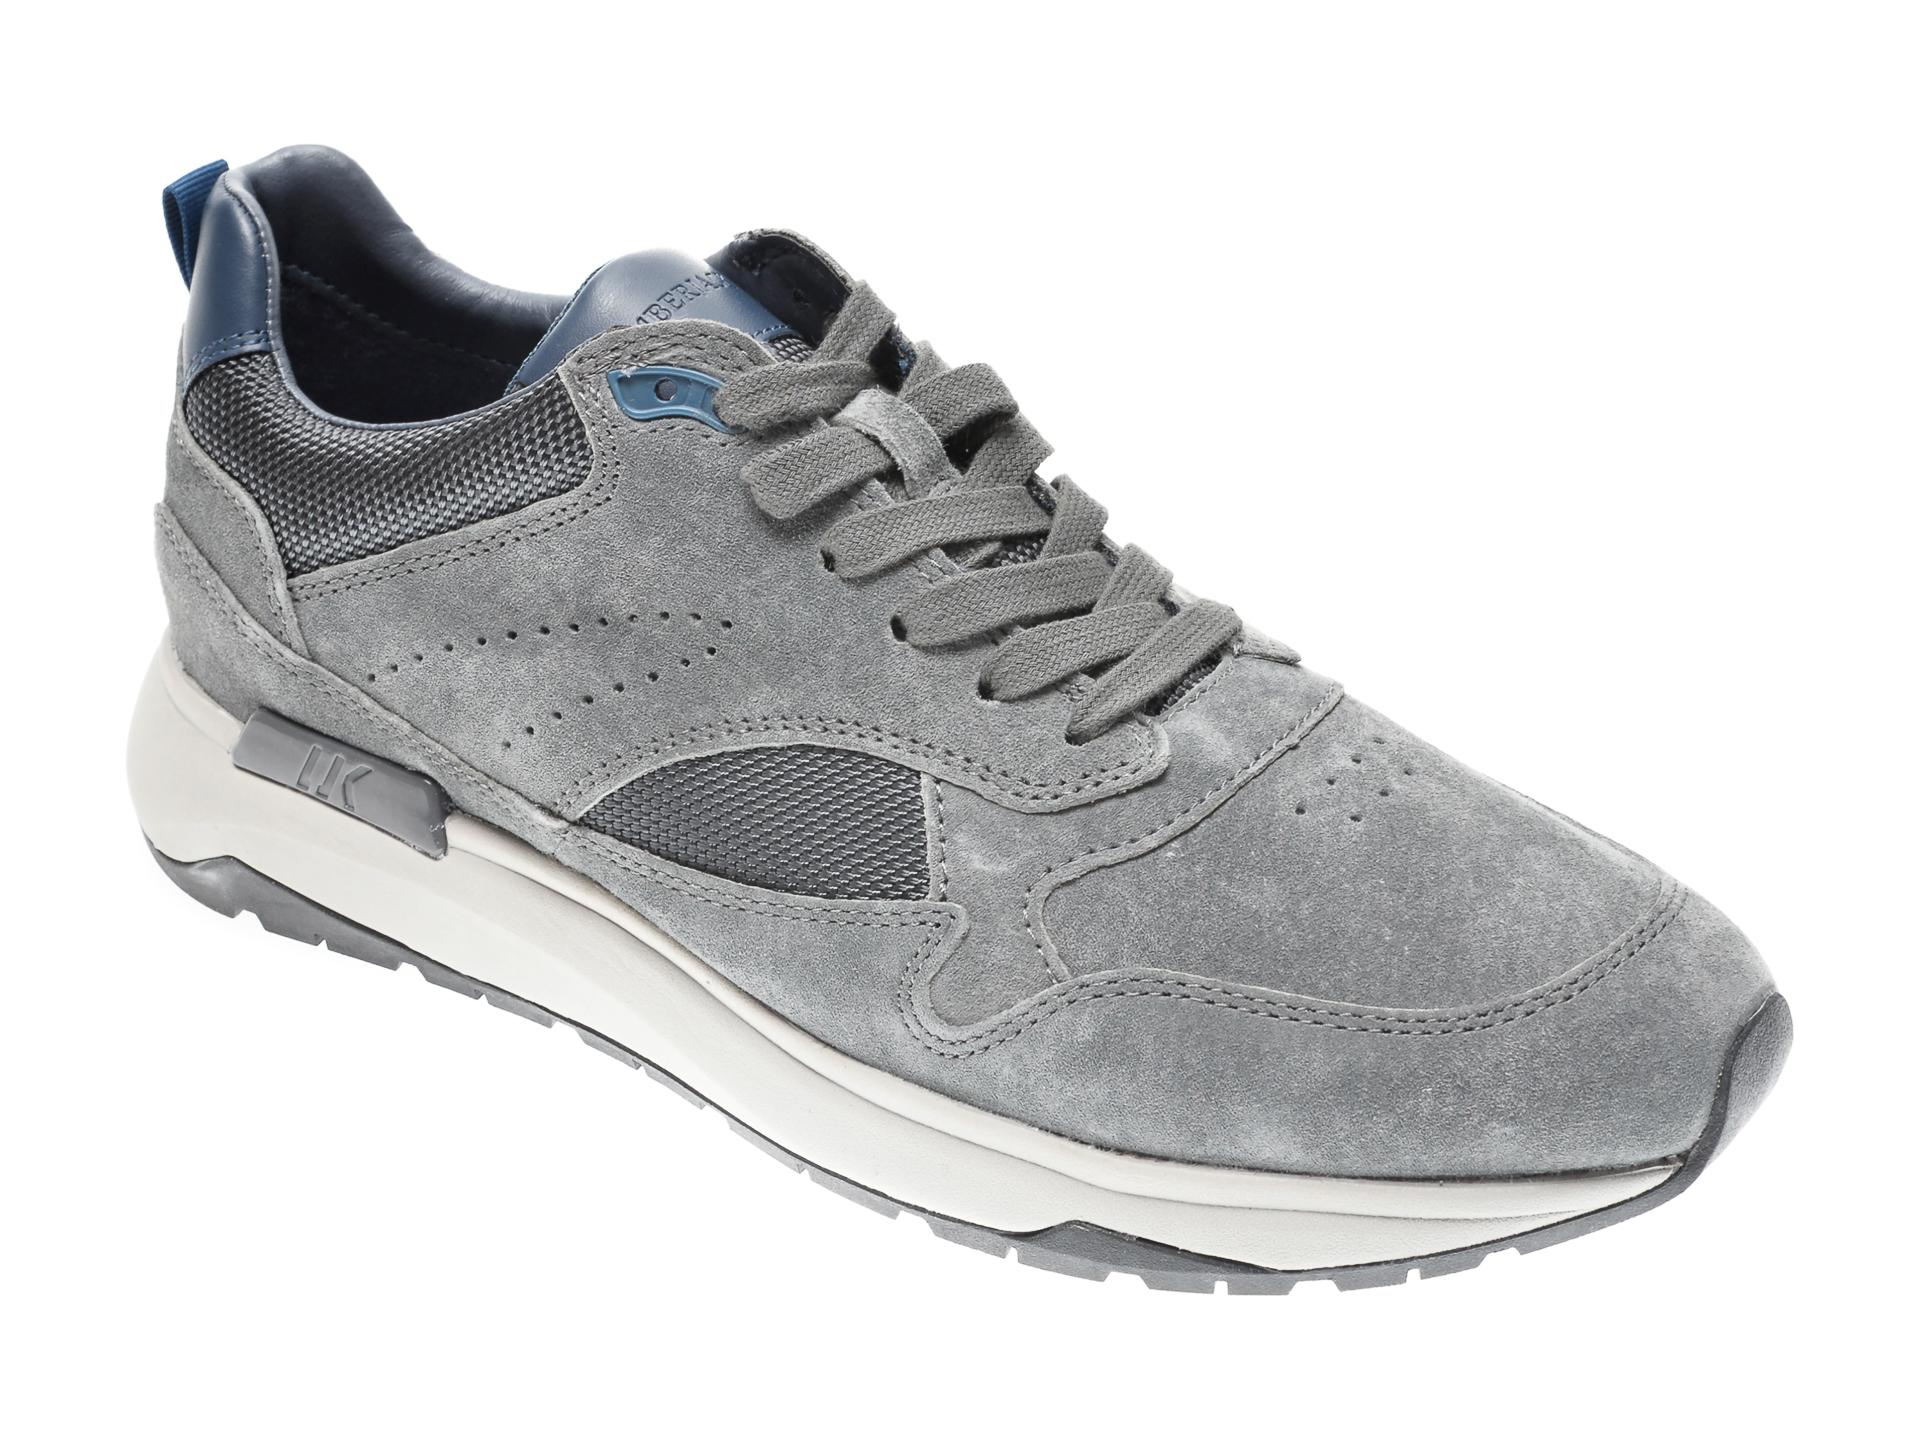 Pantofi LUMBERJACK gri, 405006, din piele intoarsa